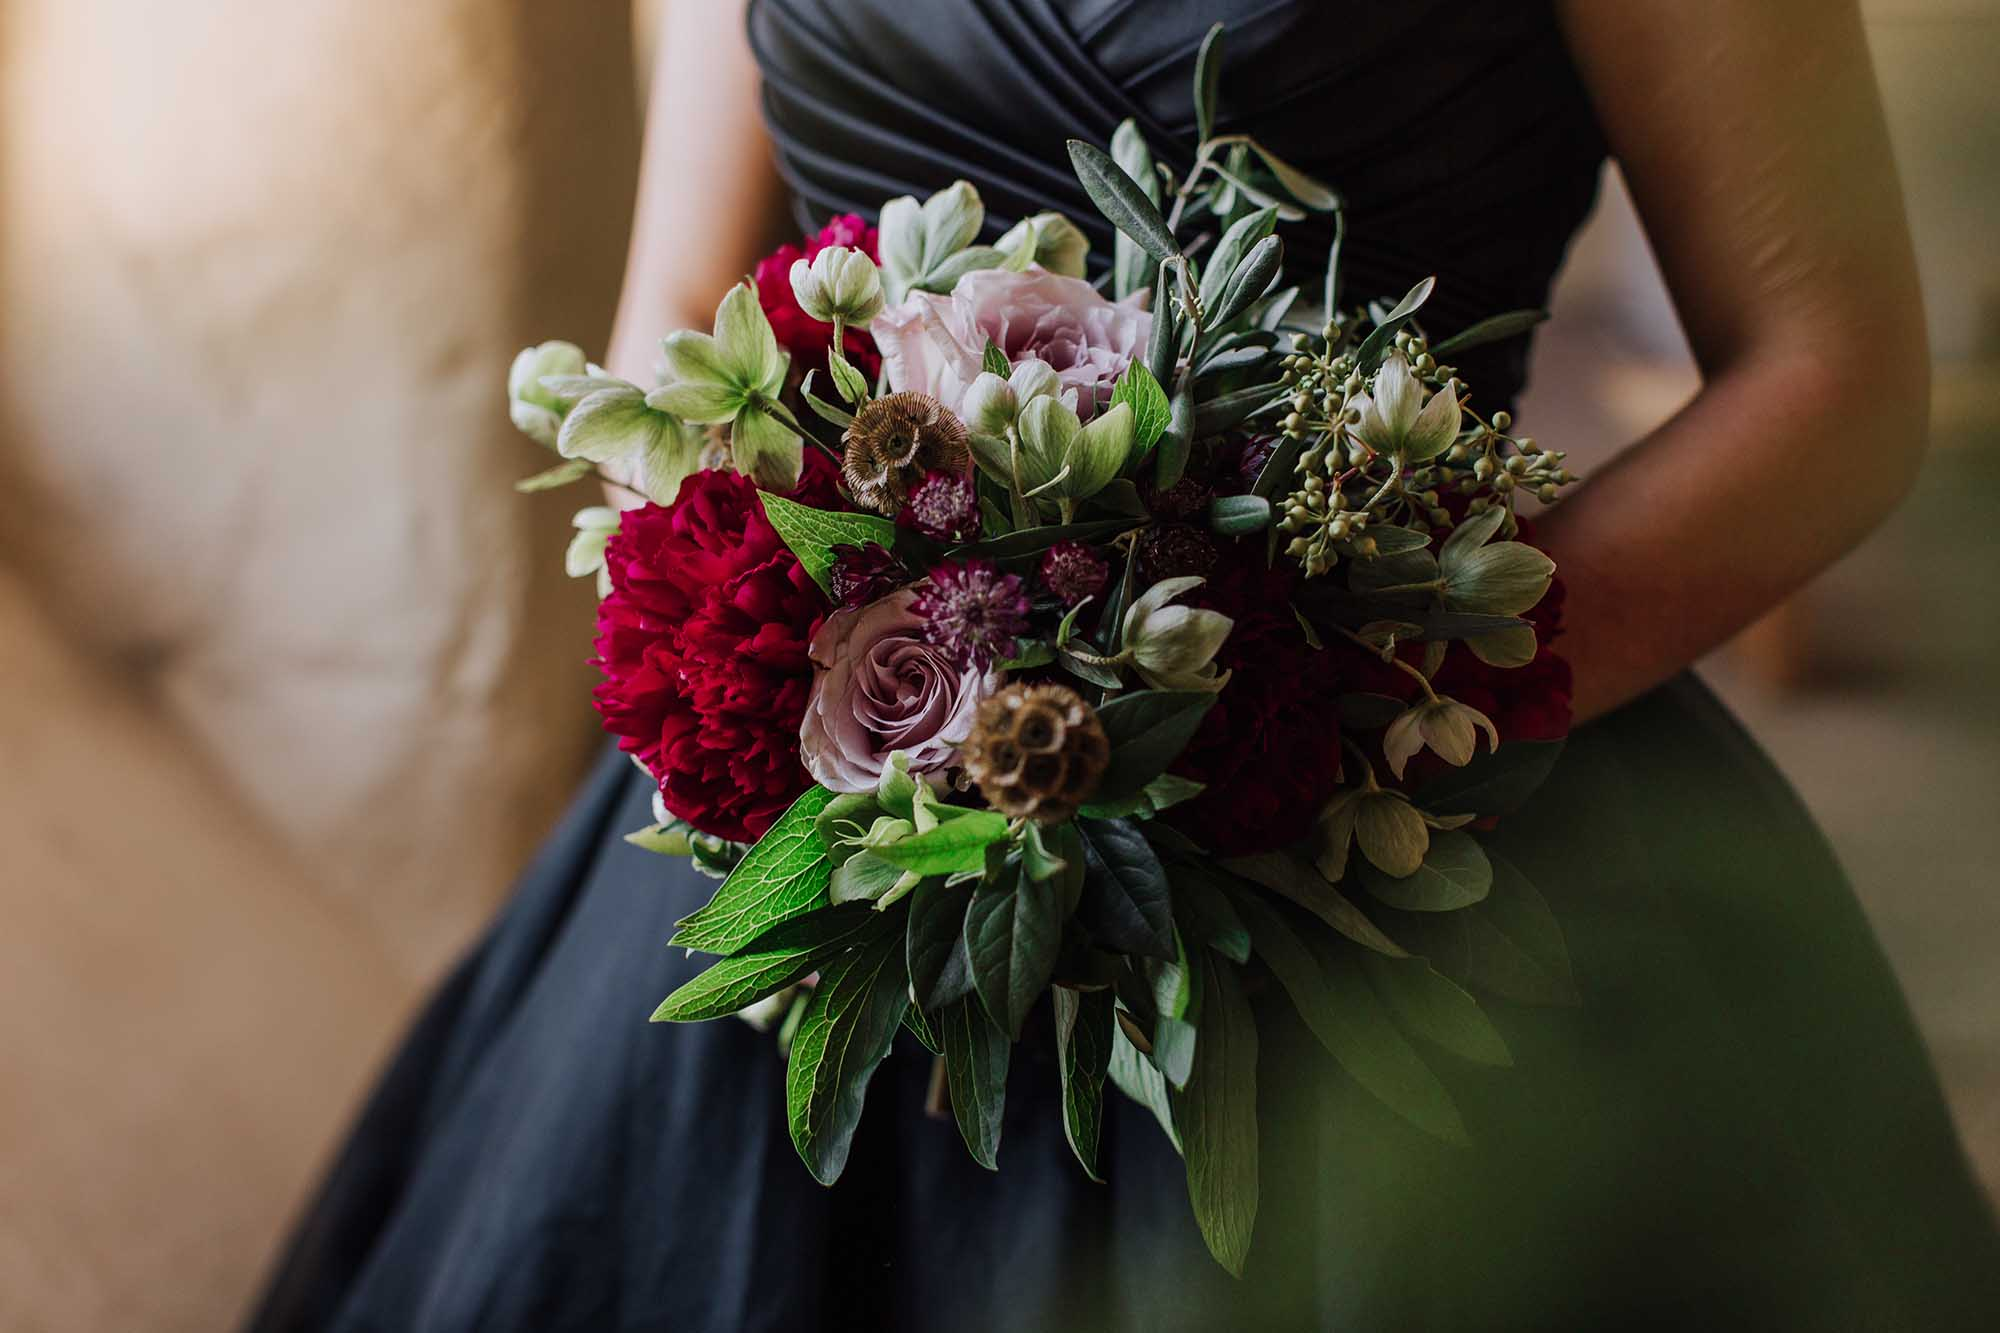 Stems Designs florist Yorkshire